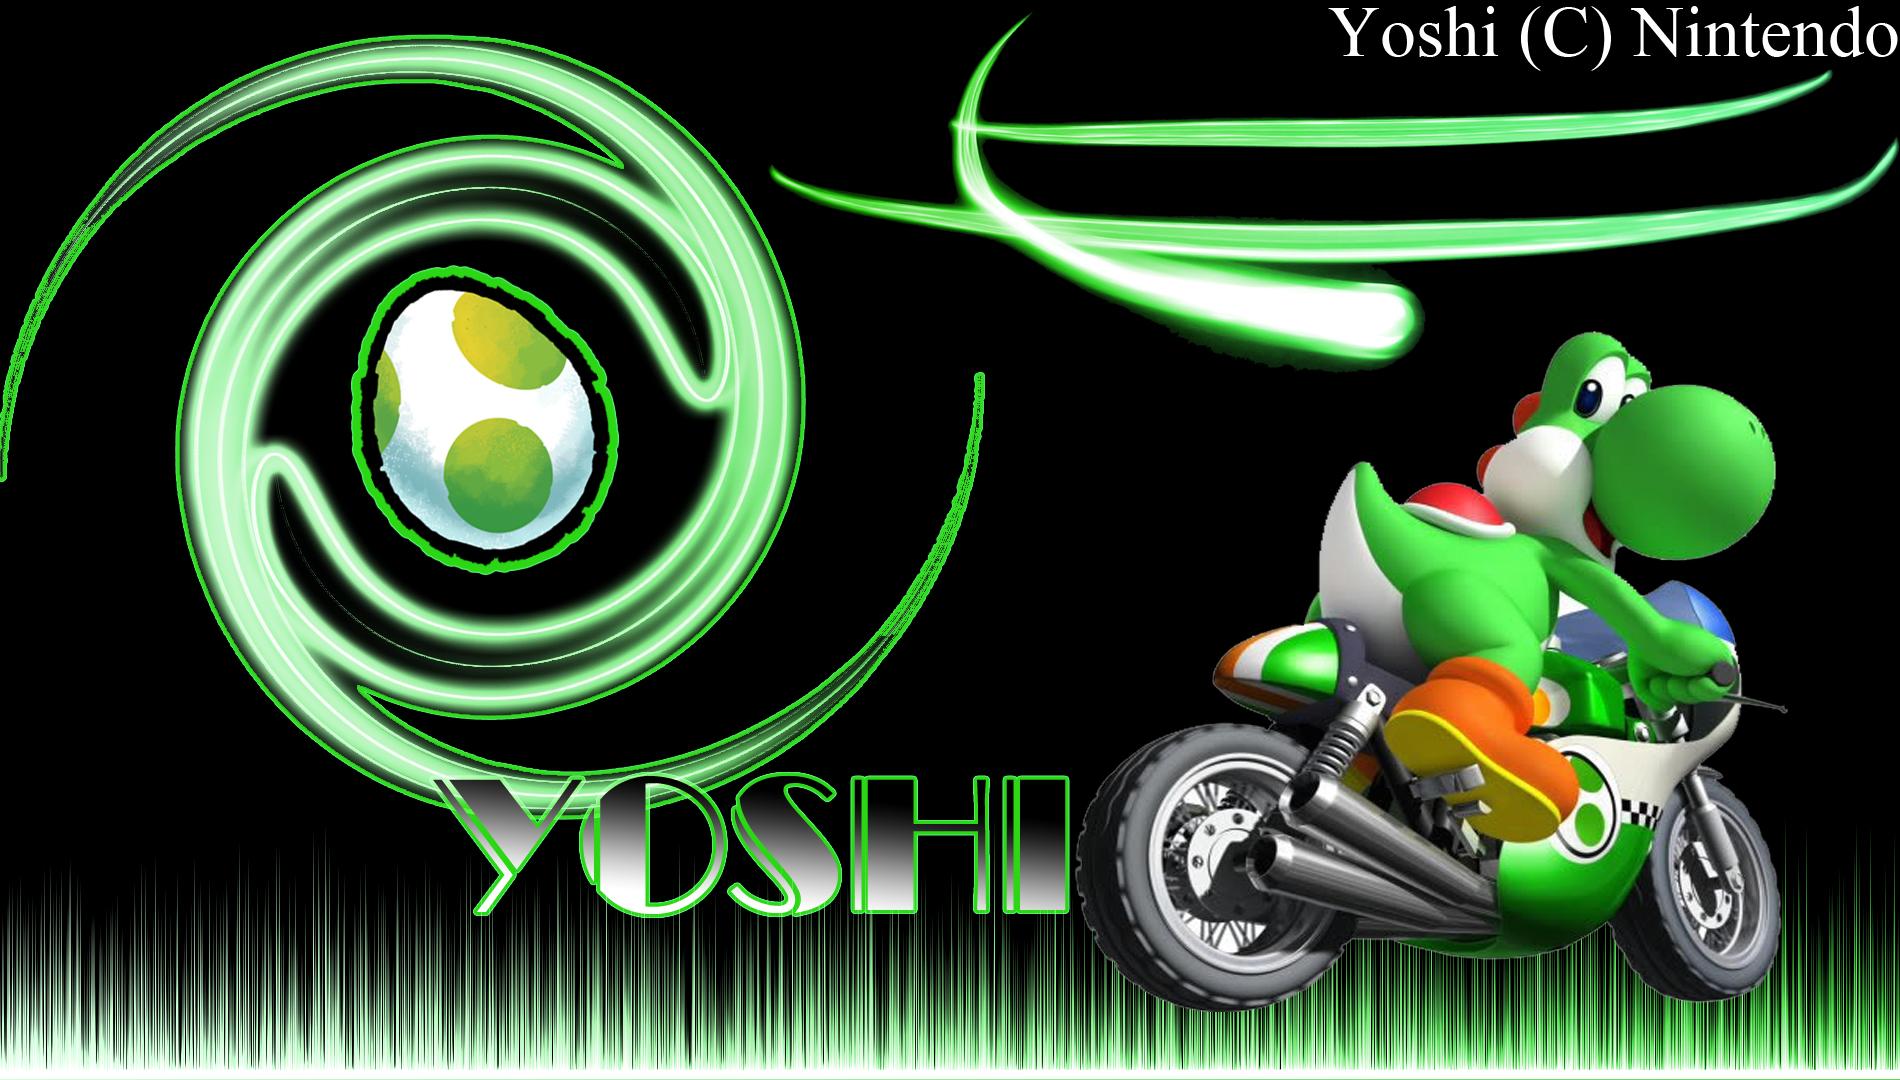 yoshi wallpaper by jrdn762 on deviantart